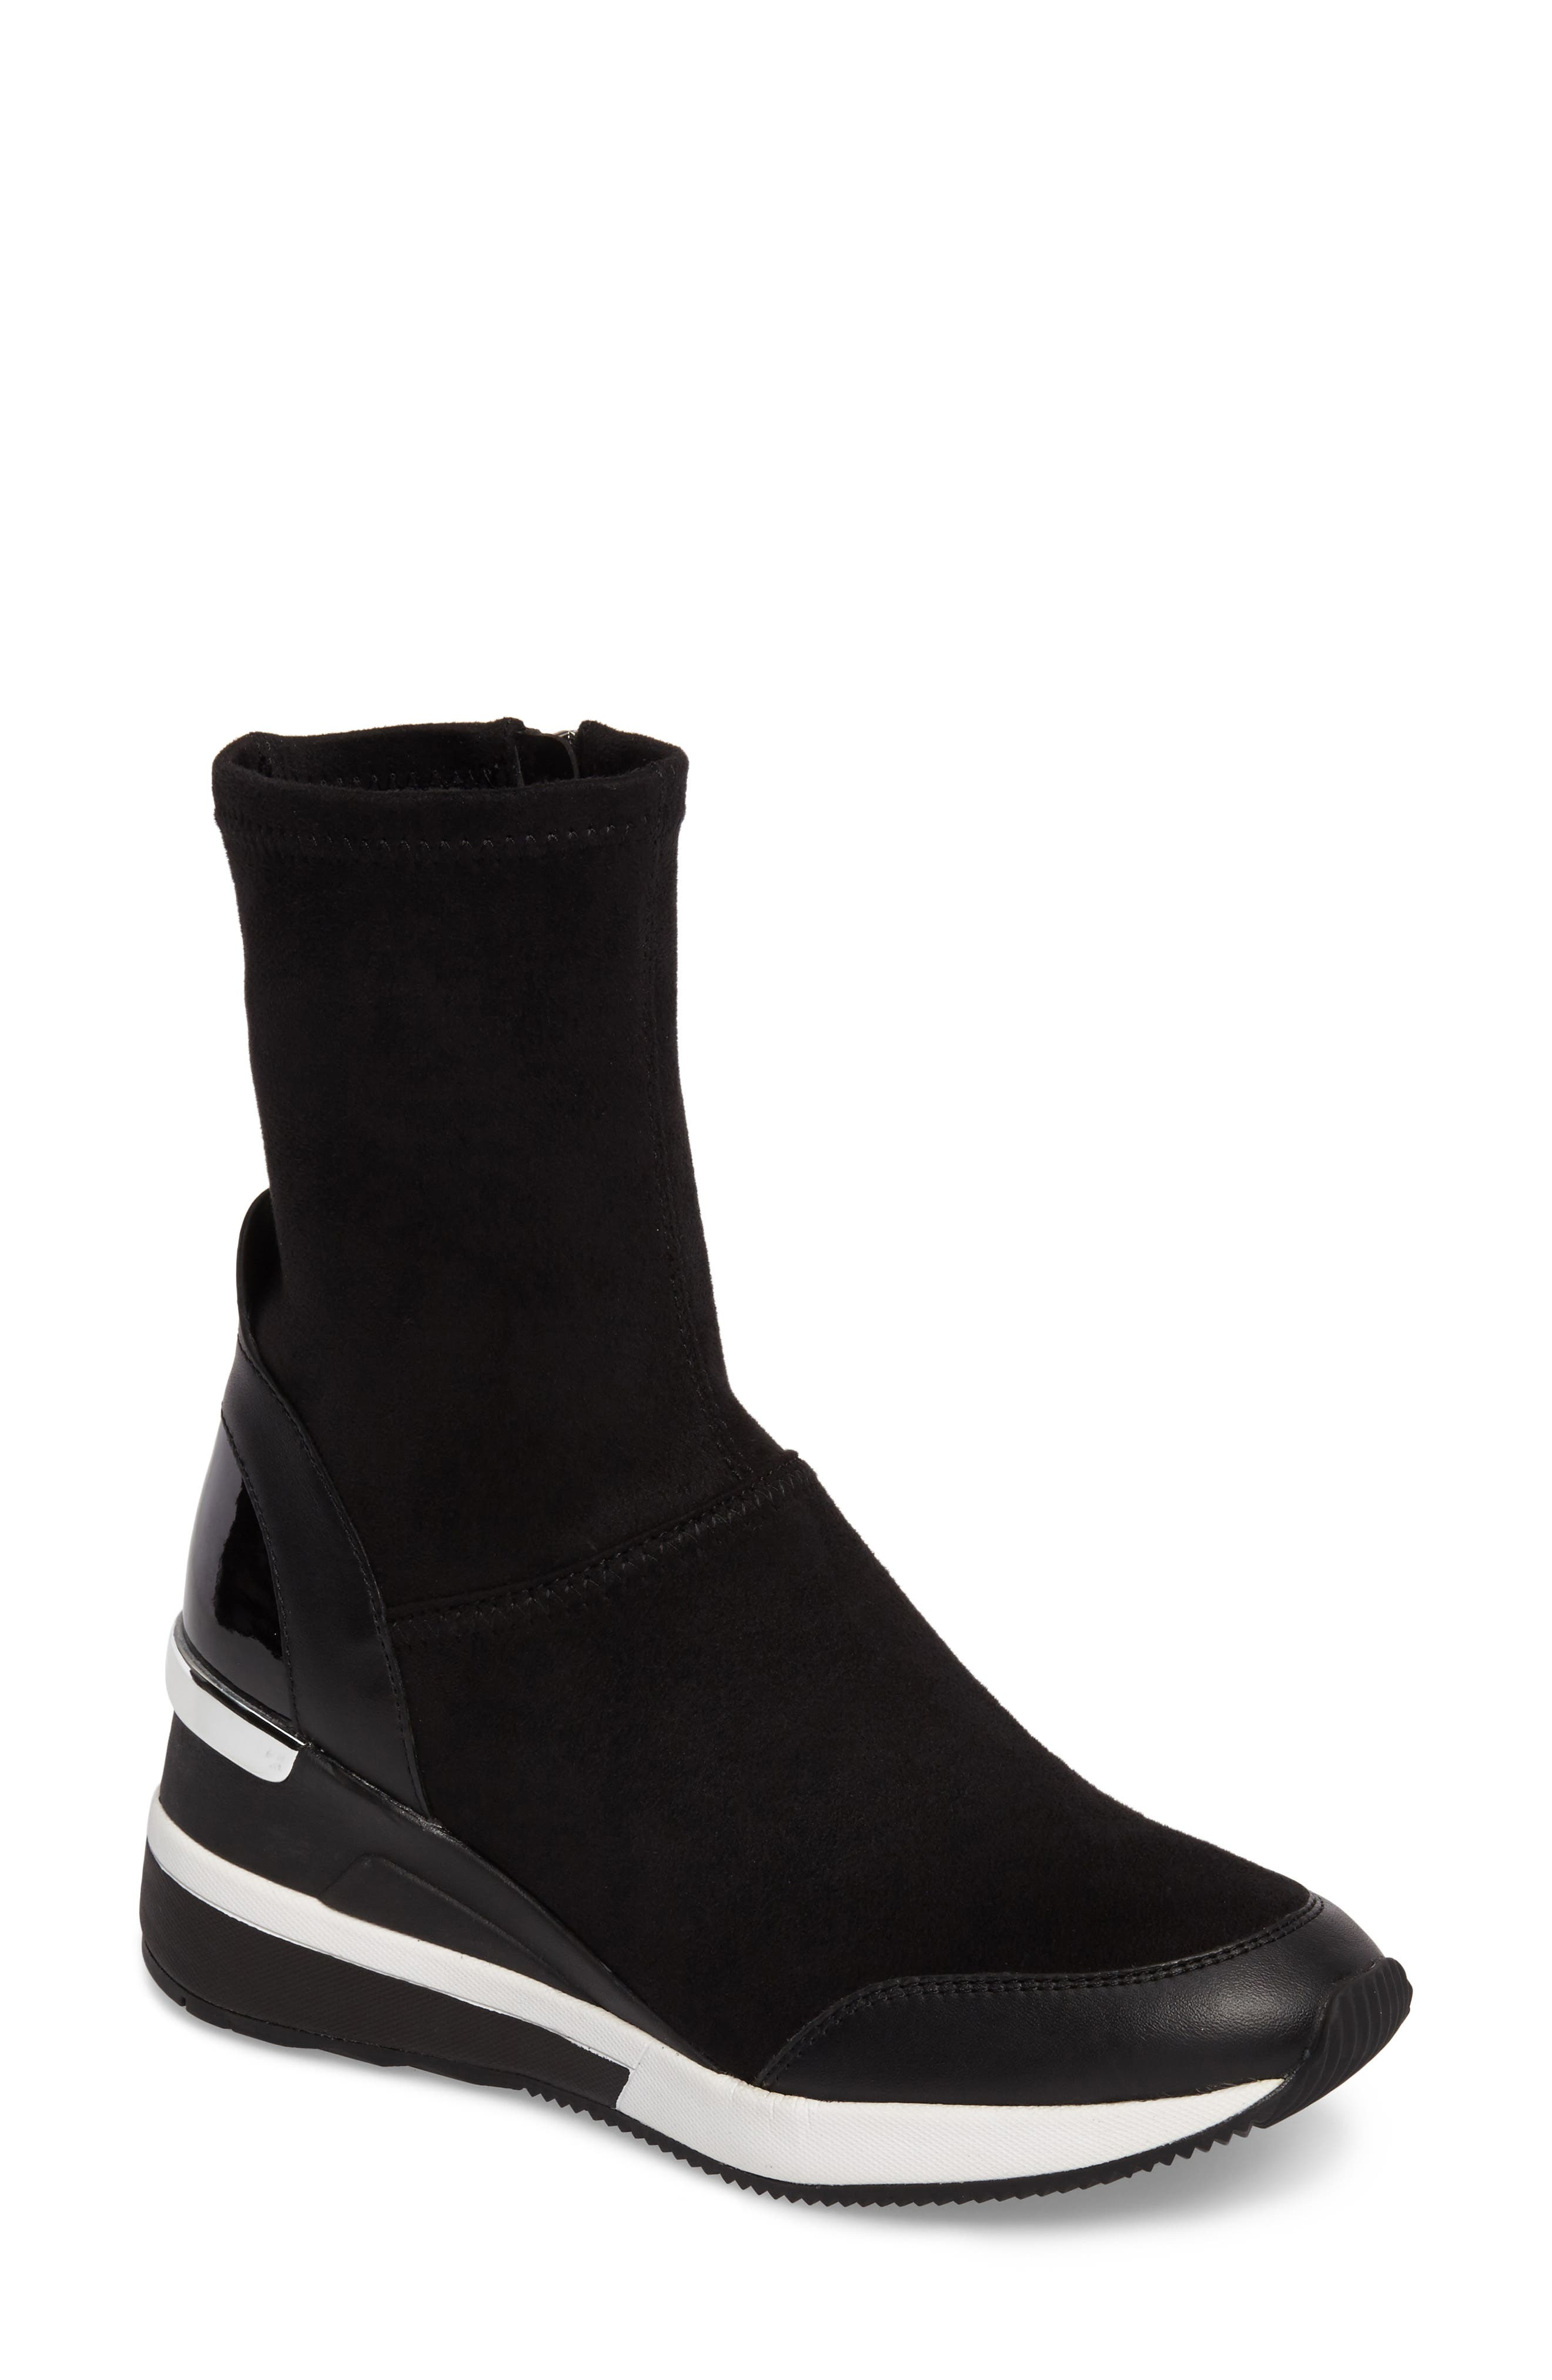 Alternate Image 1 Selected - MICHAEL Michael Kors 'Ace' Wedge Sneaker Bootie (Women)